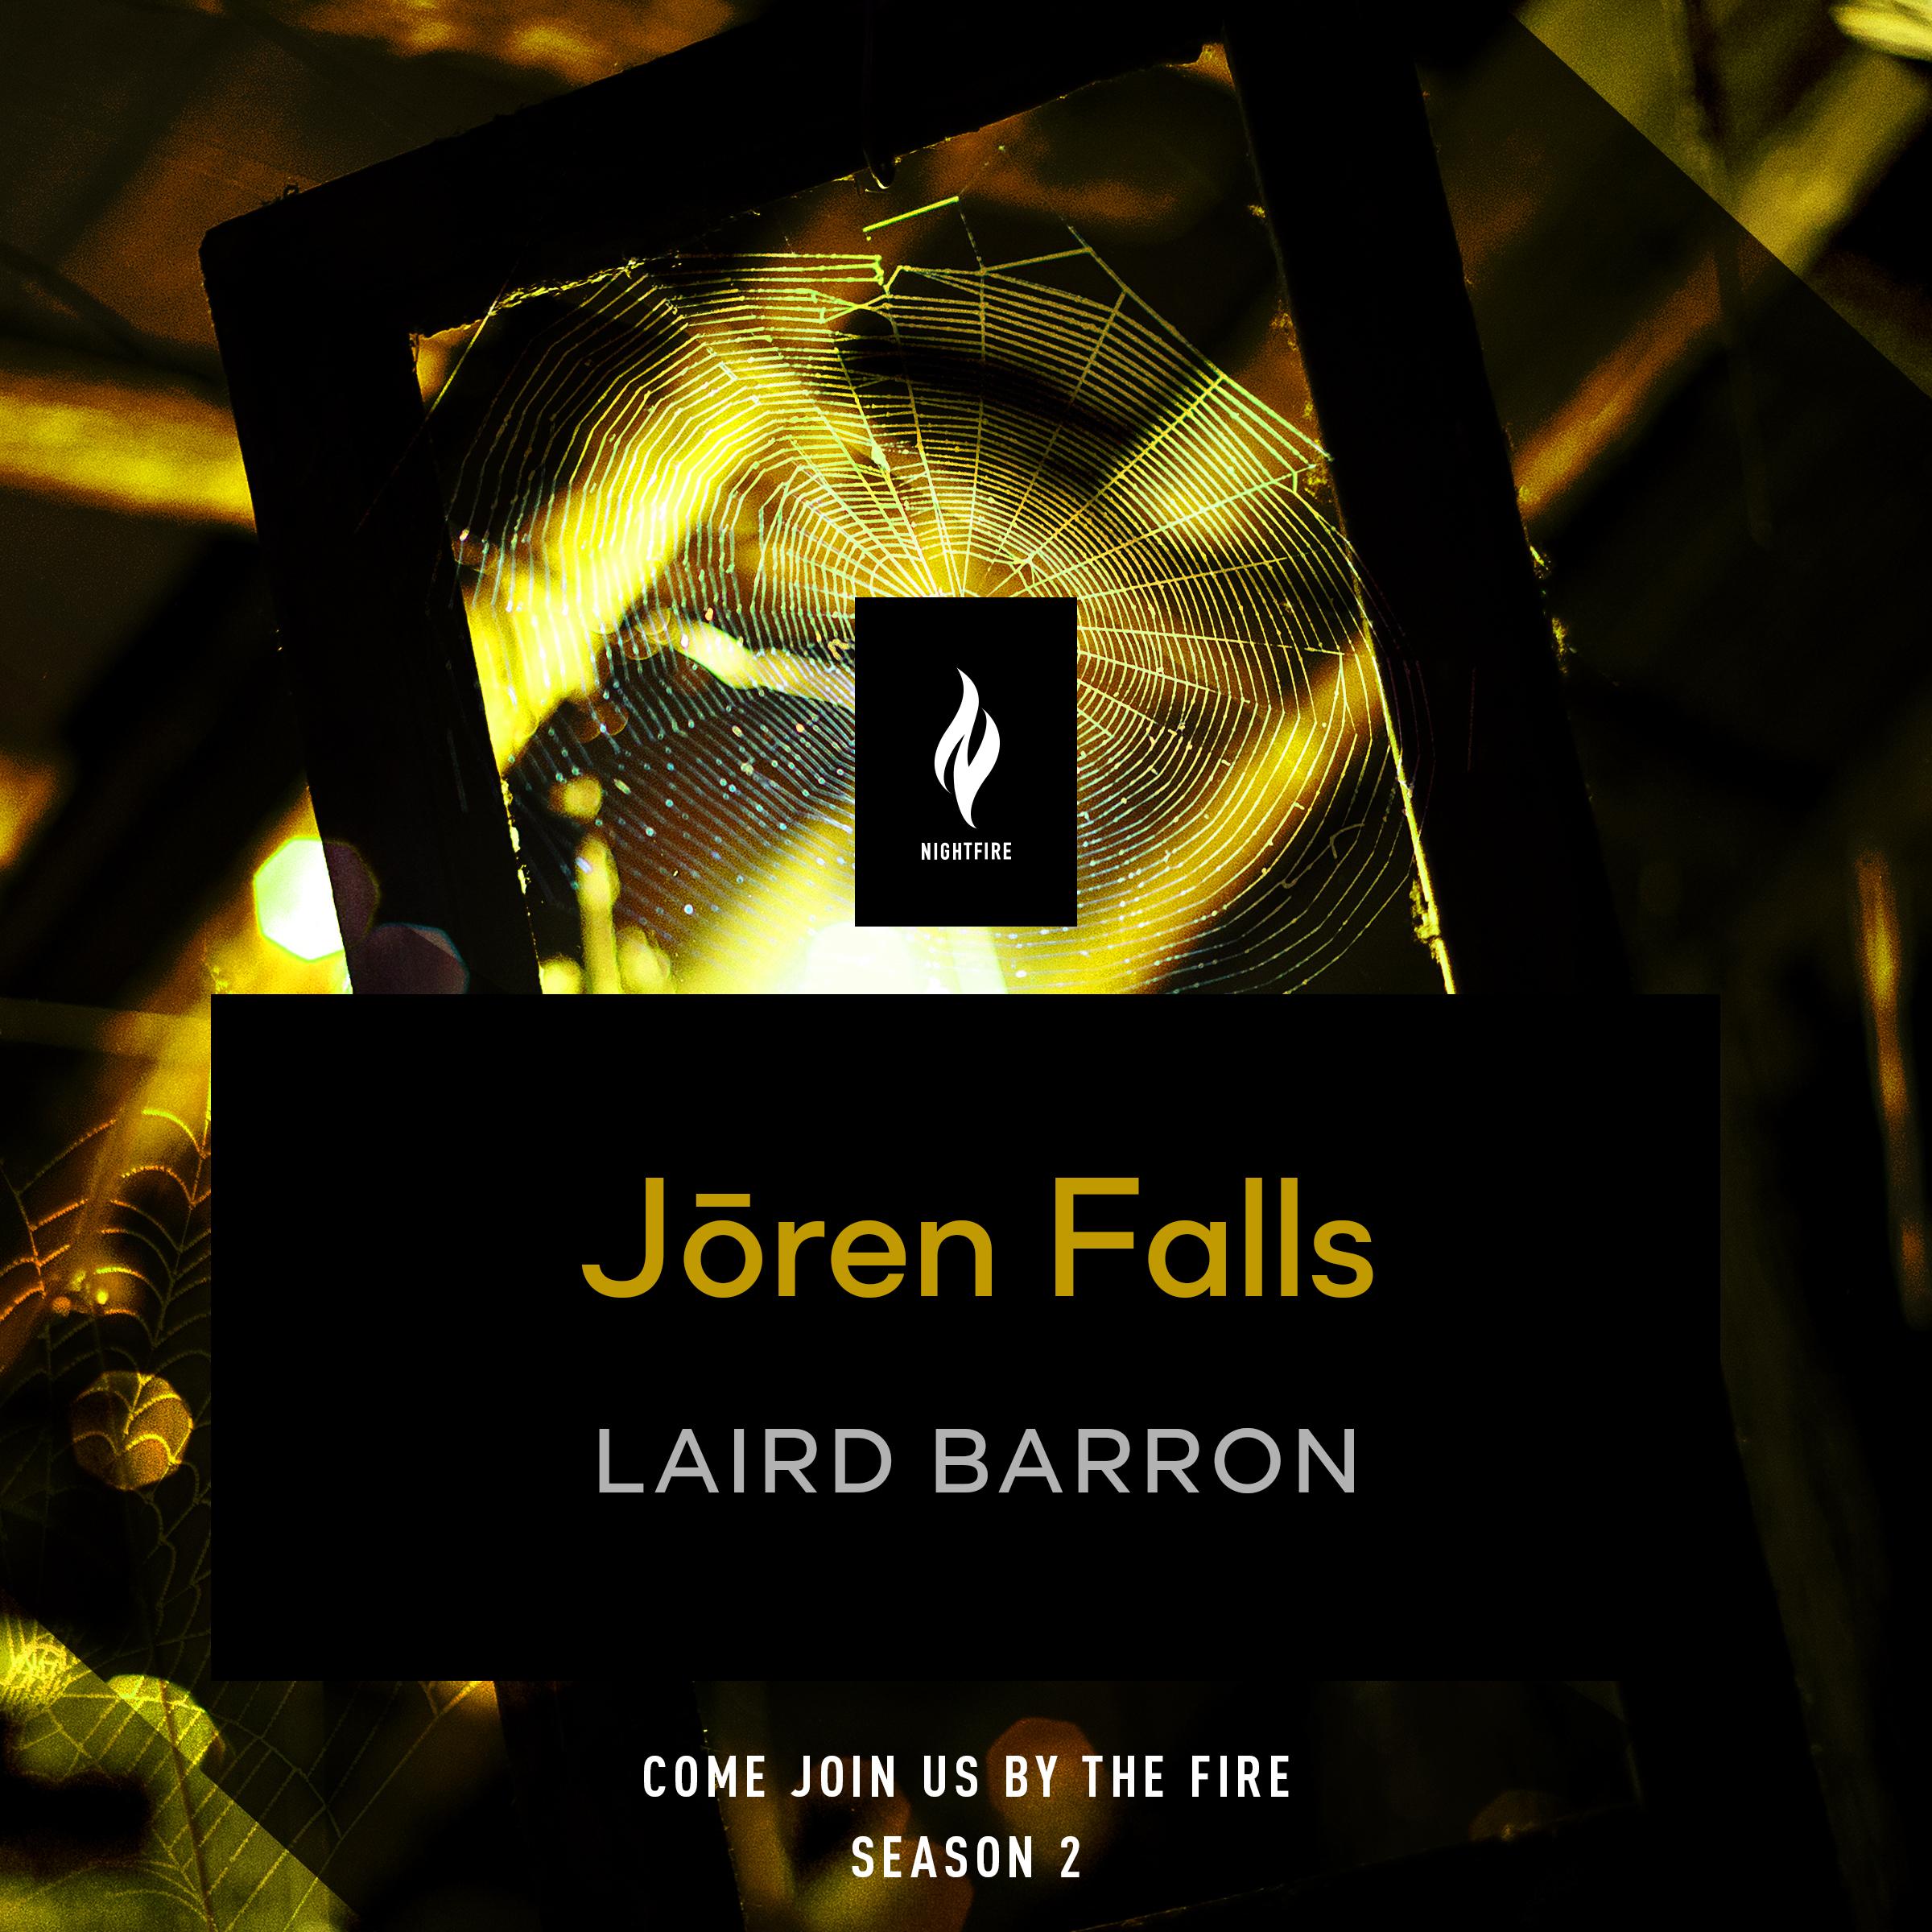 JorenFalls_Barron